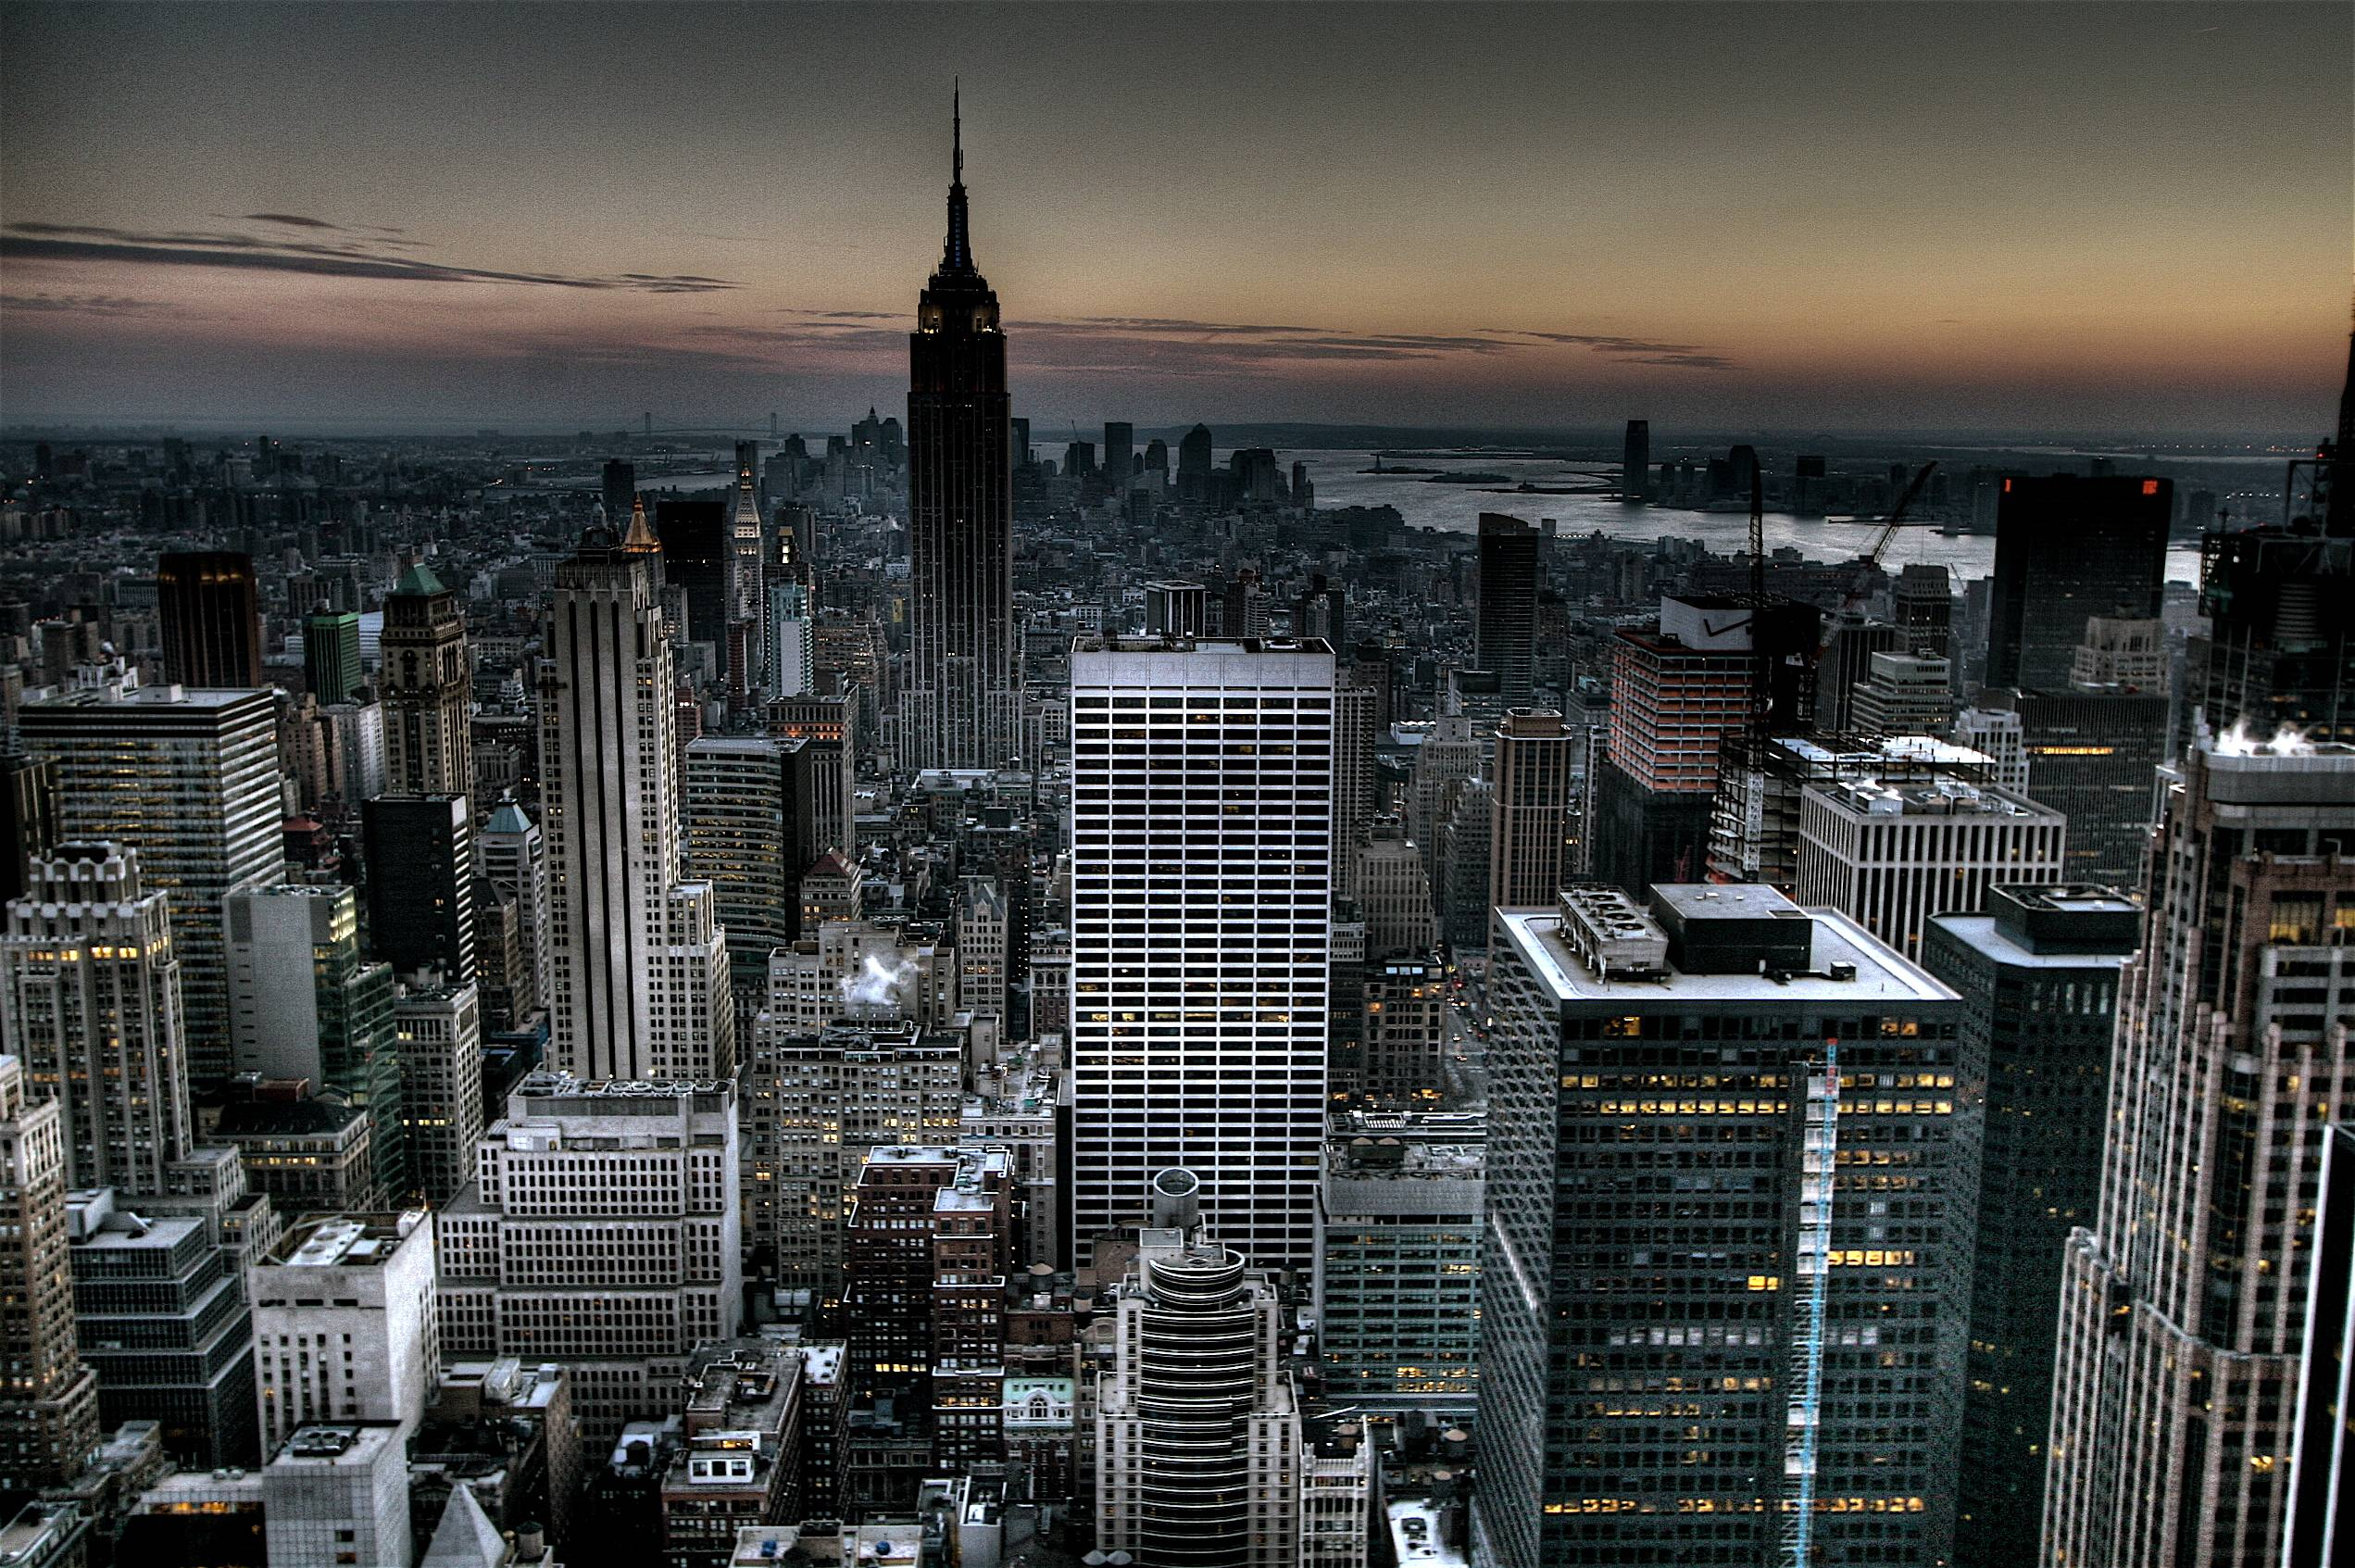 New York City Desktop Backgrounds 2543x1693